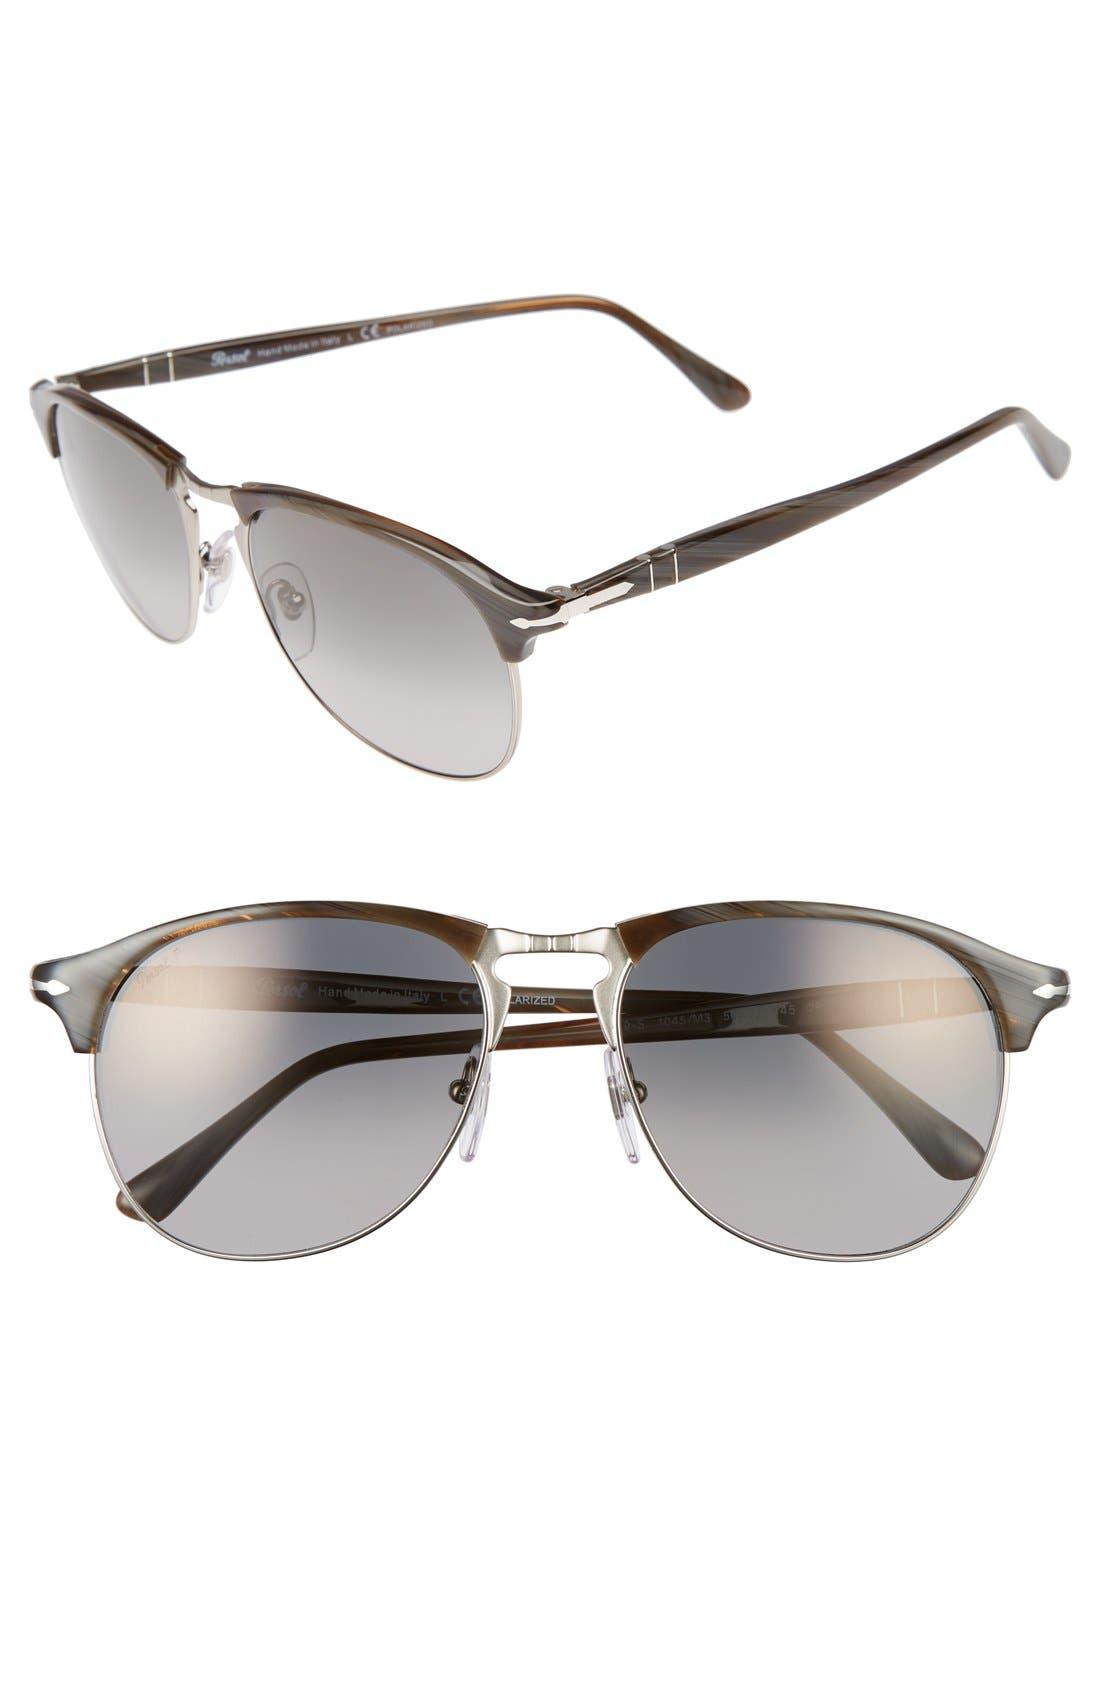 56mm Keyhole Sunglasses,                             Main thumbnail 1, color,                             GREY HORN